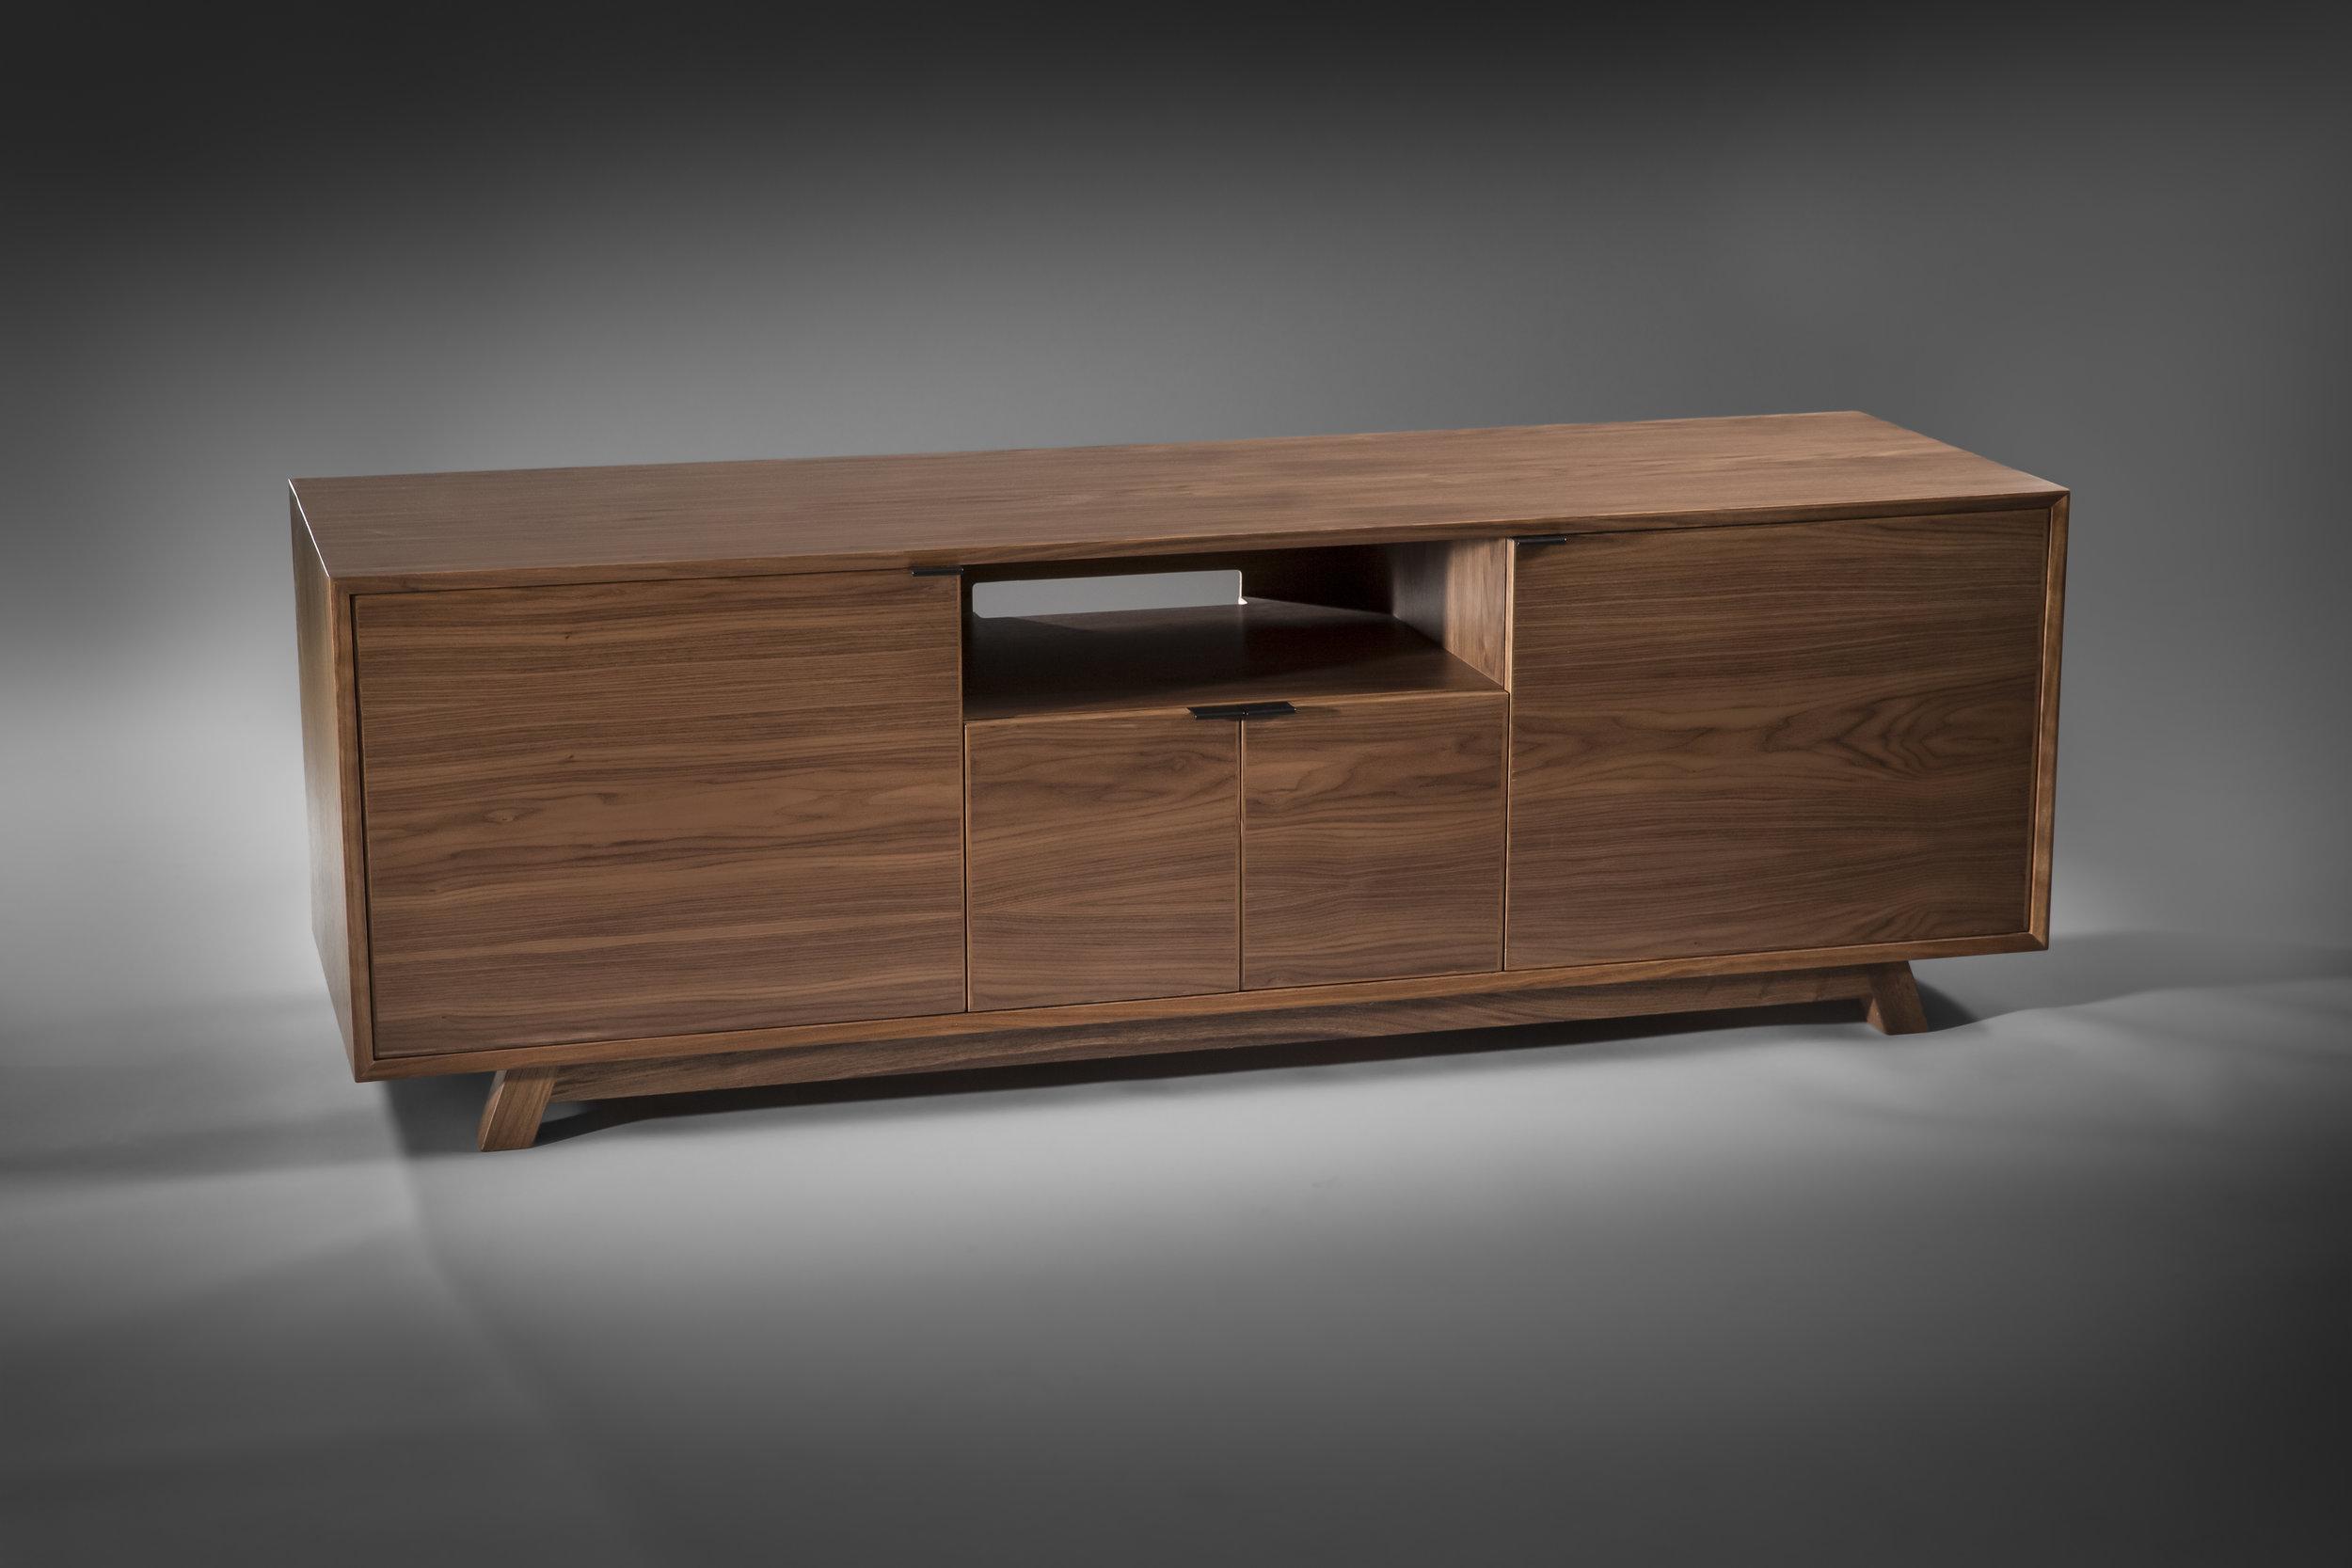 20150220_furniture_0097.jpg